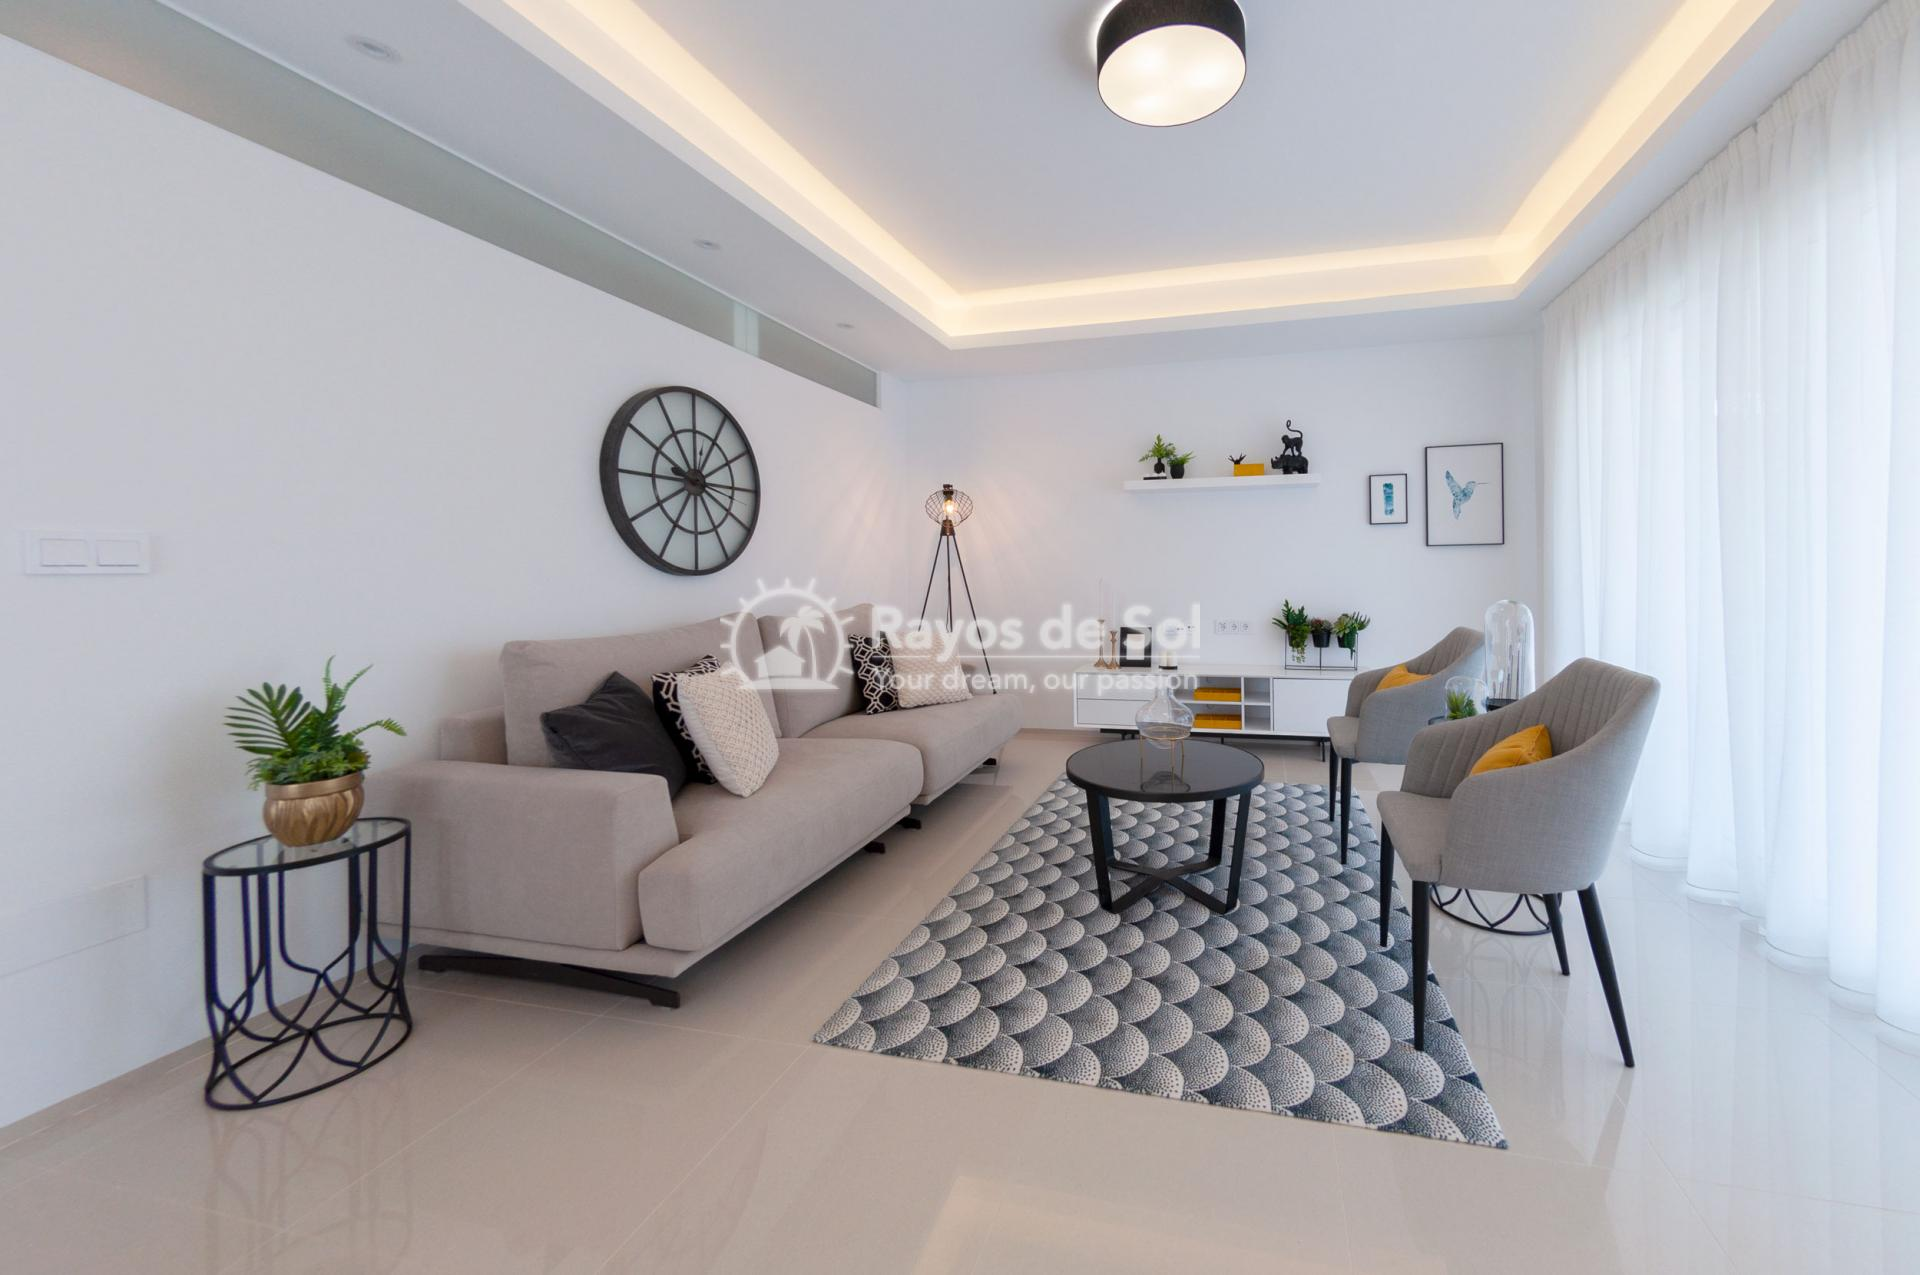 Ground floor apartment  in Doña Pepa, Ciudad Quesada, Costa Blanca (Fortuna-olivos-BG2) - 3